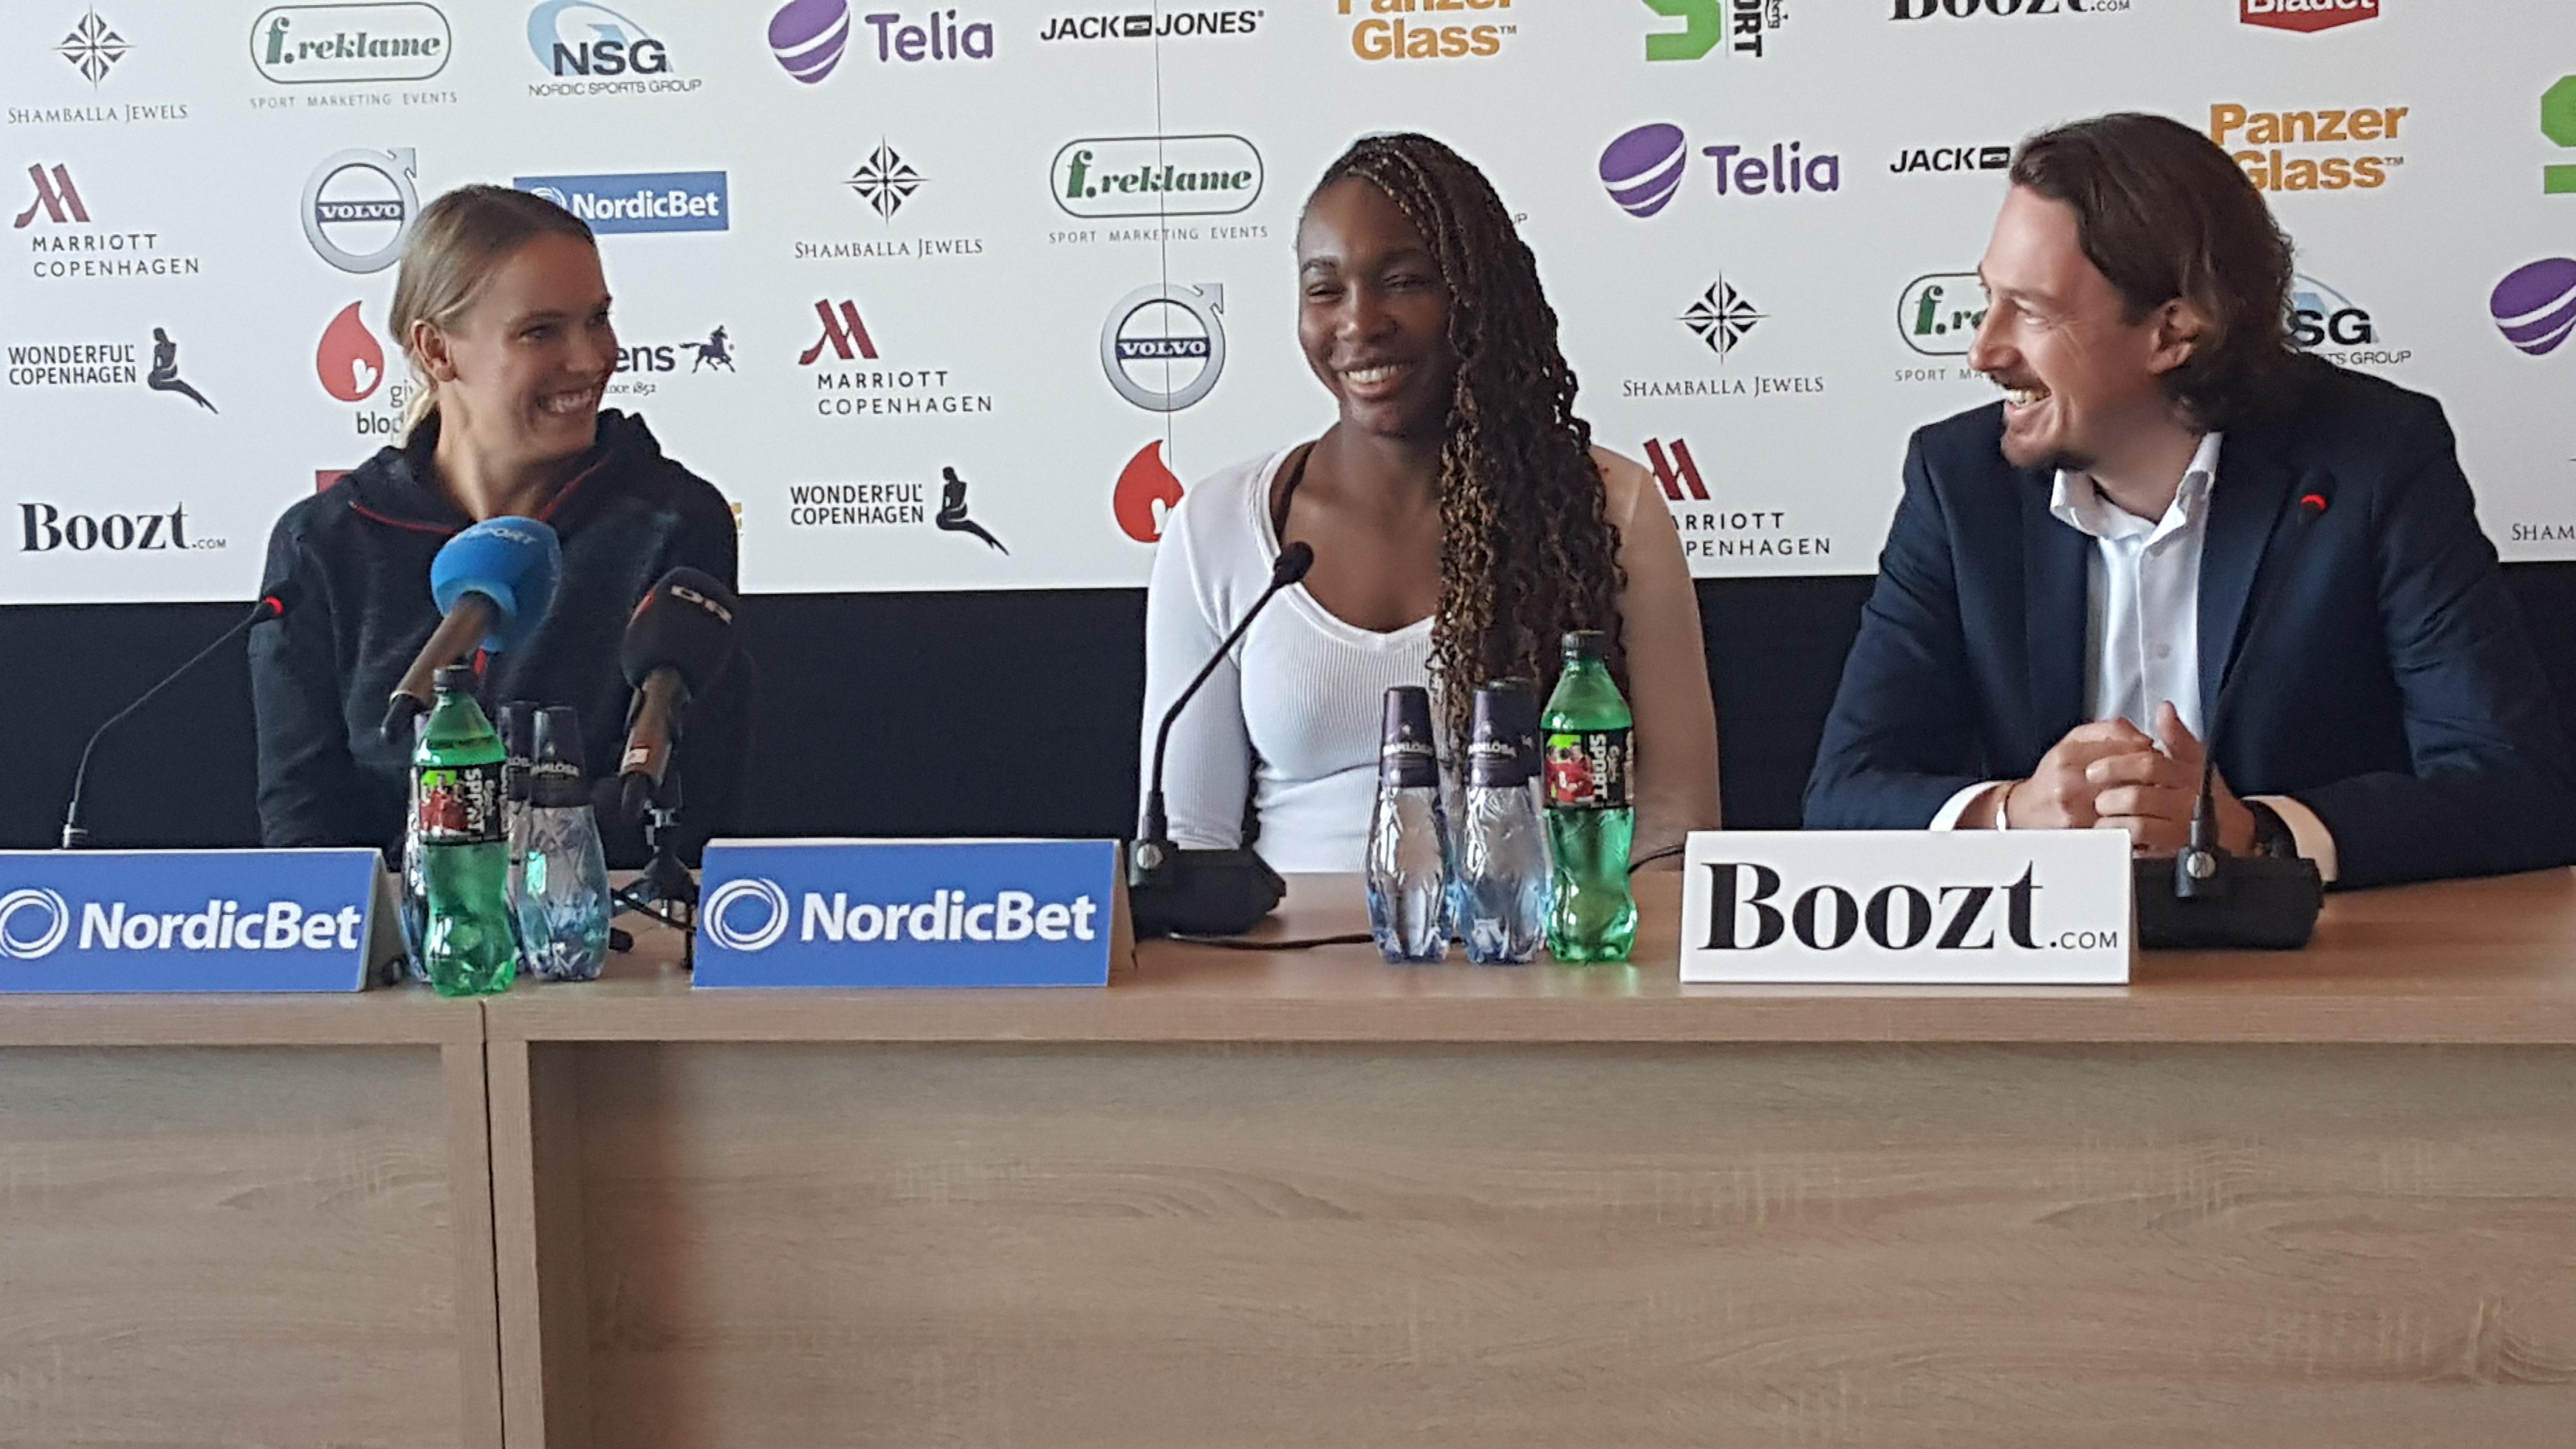 Caroline Wozniacki, Venus Williams, Mads Frederiksen